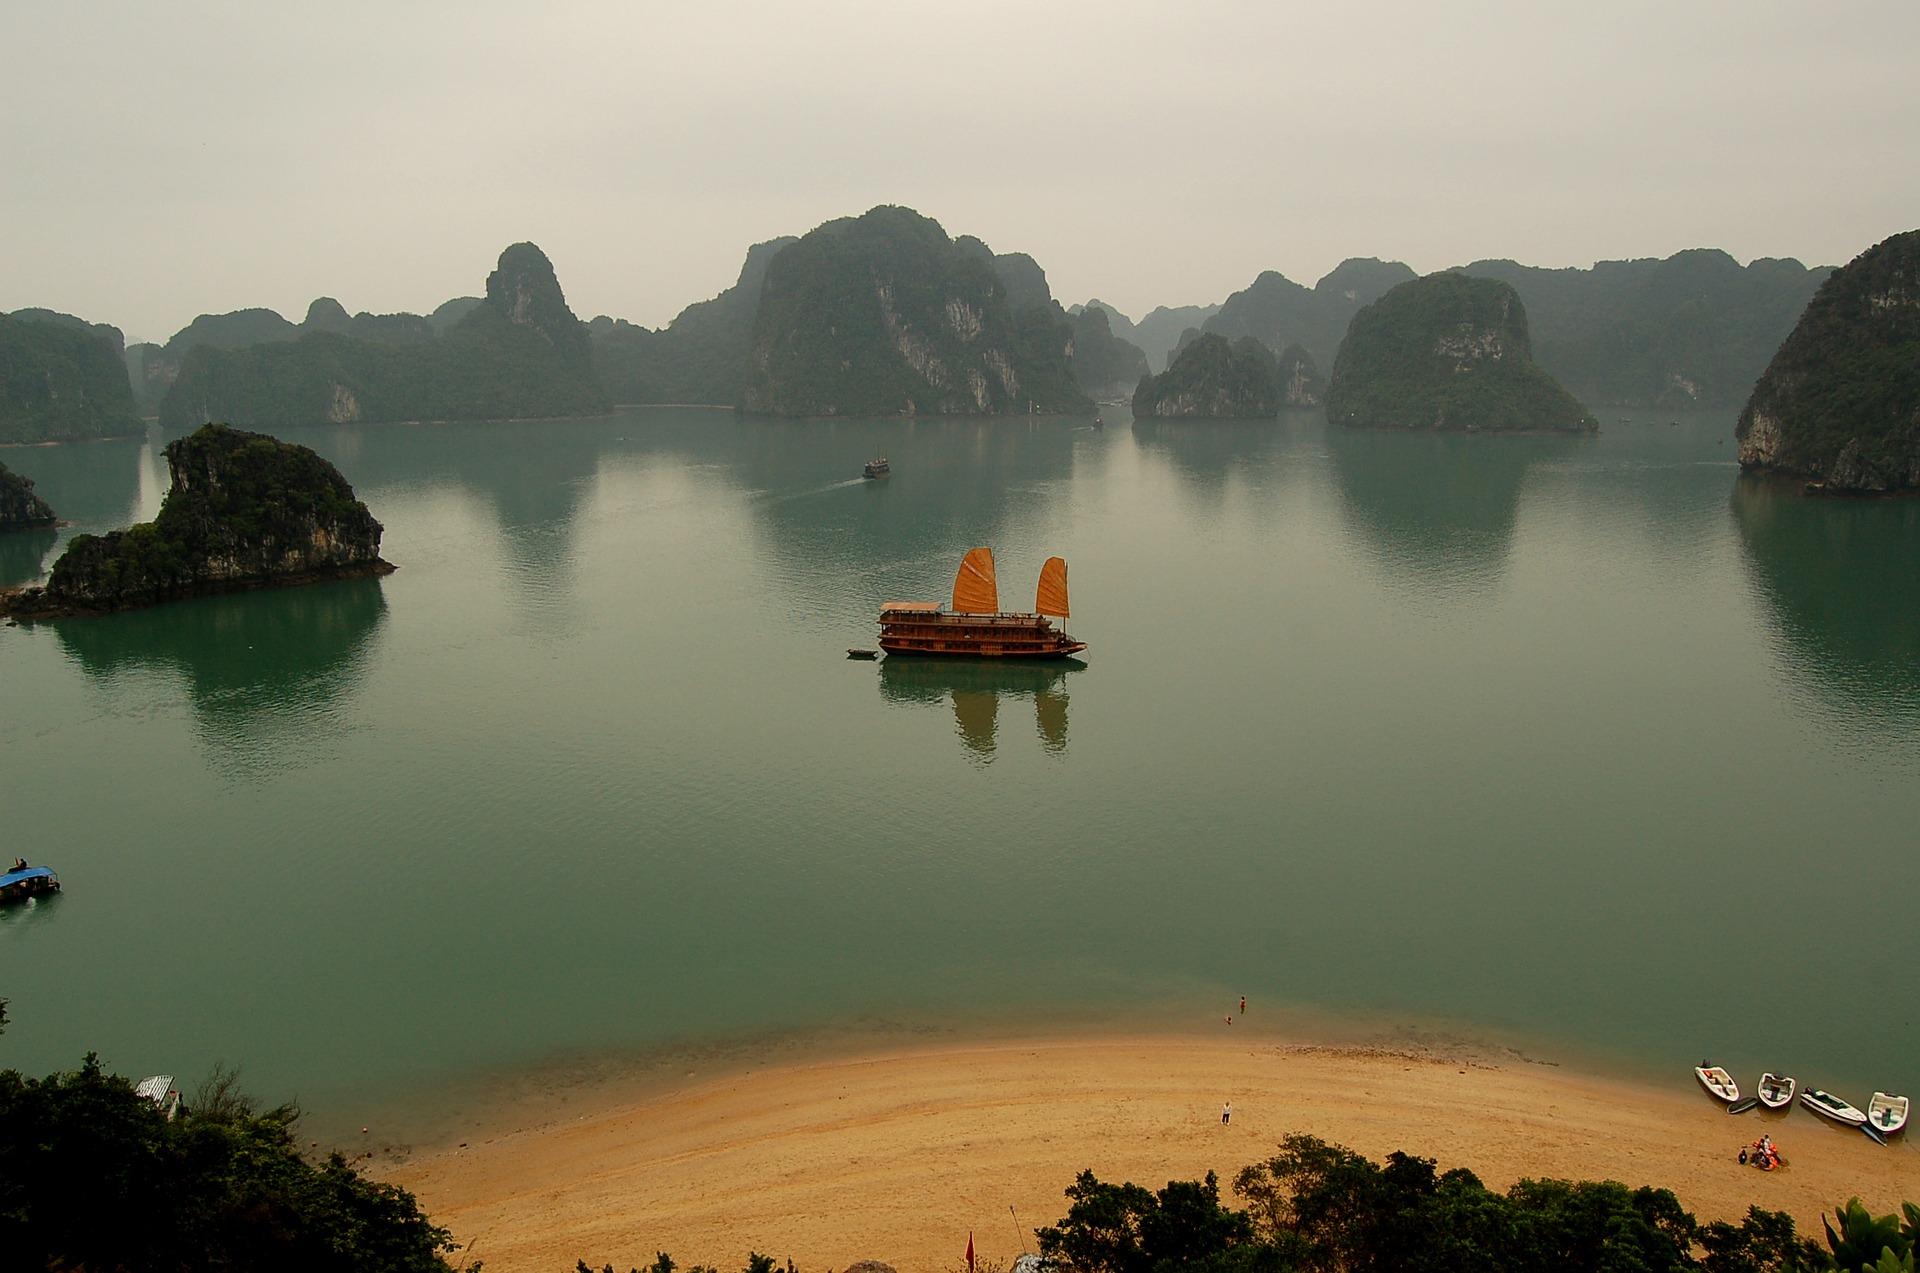 vietnam-2672163_1920.jpg